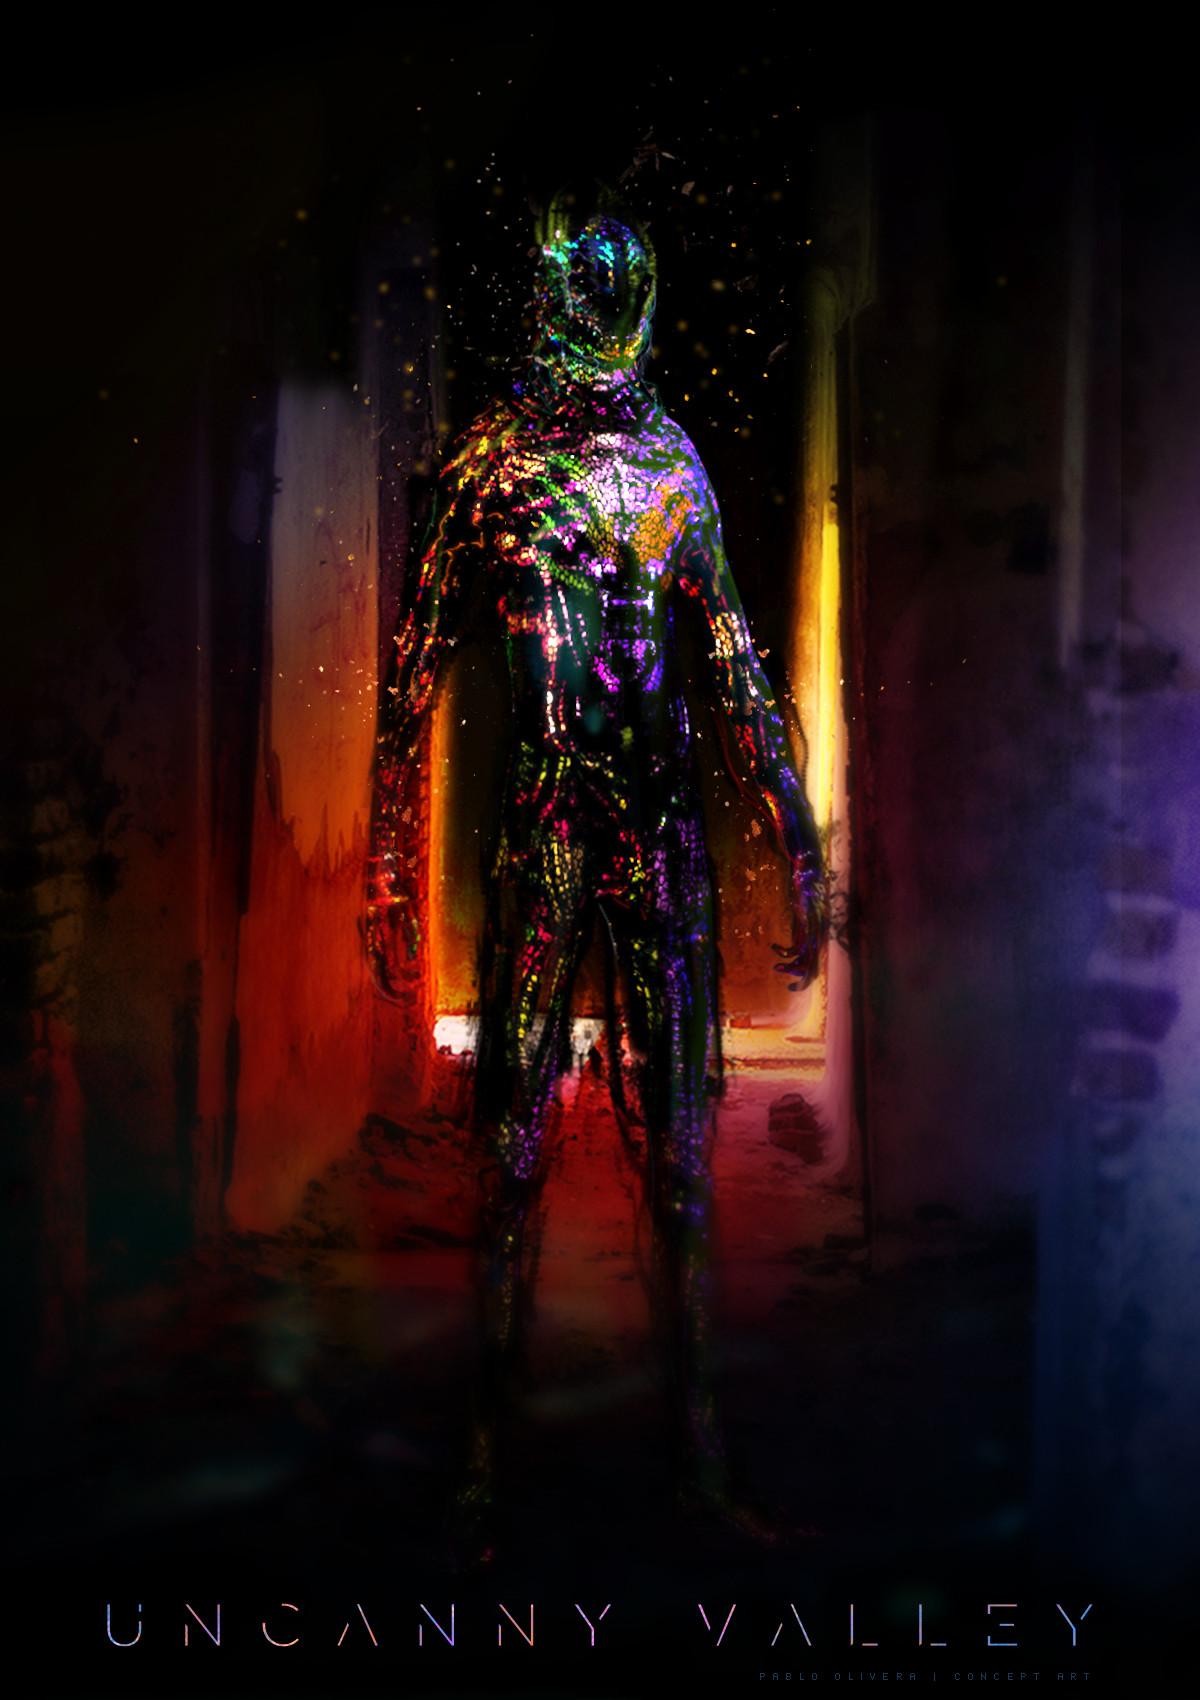 Pablo olivera still alien character design